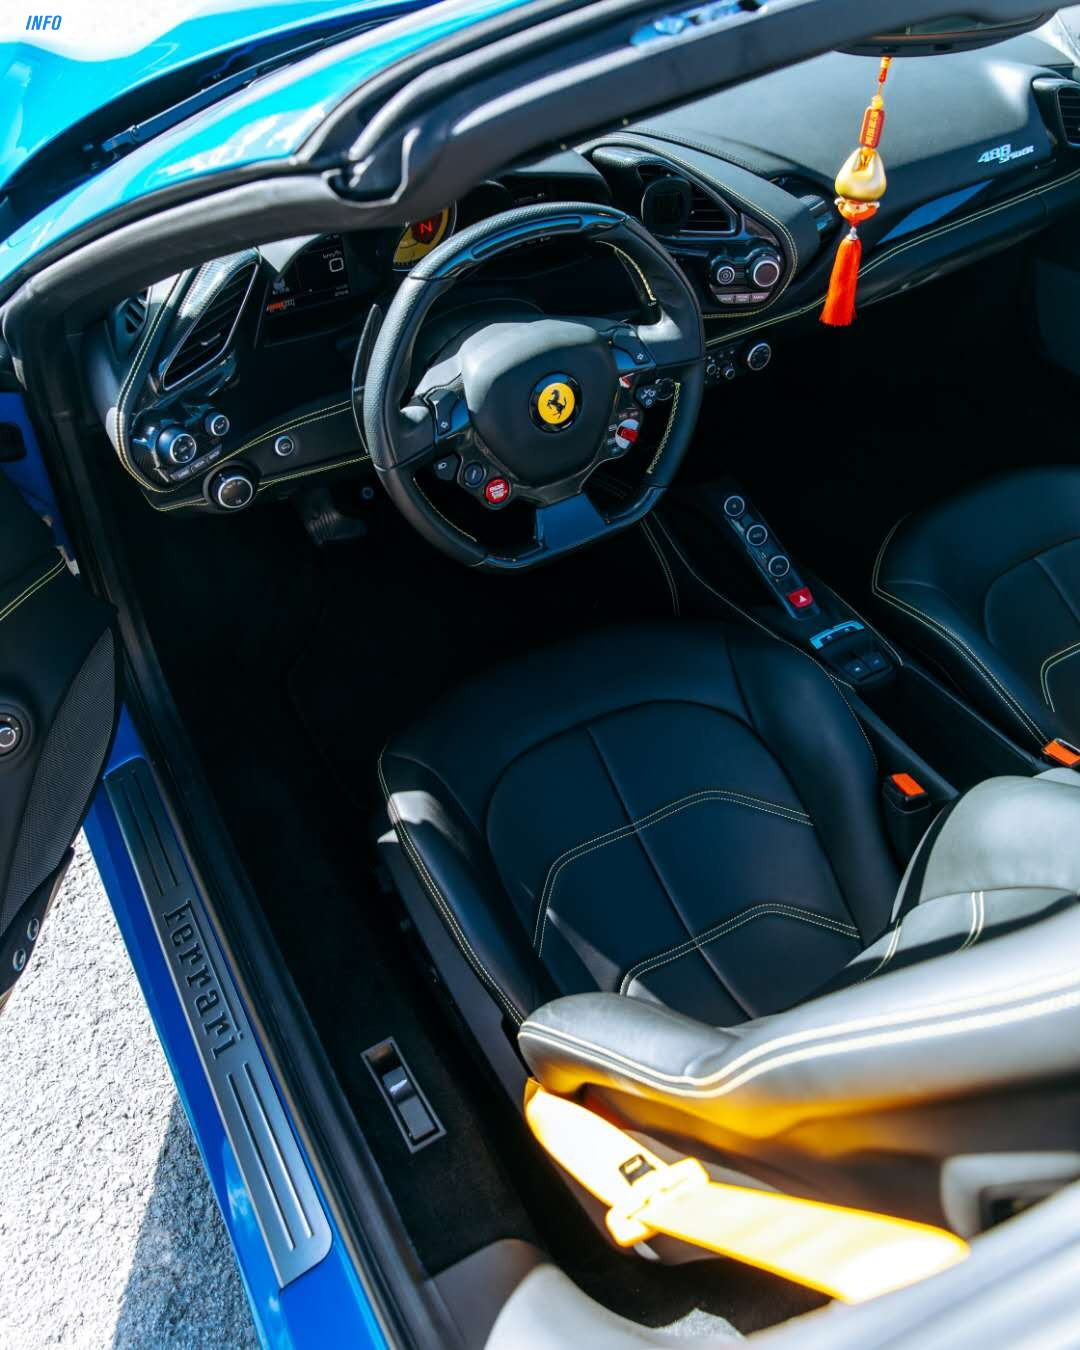 2018 Ferrari 488 spider - INFOCAR - Toronto's Most Comprehensive New and Used Auto Trading Platform